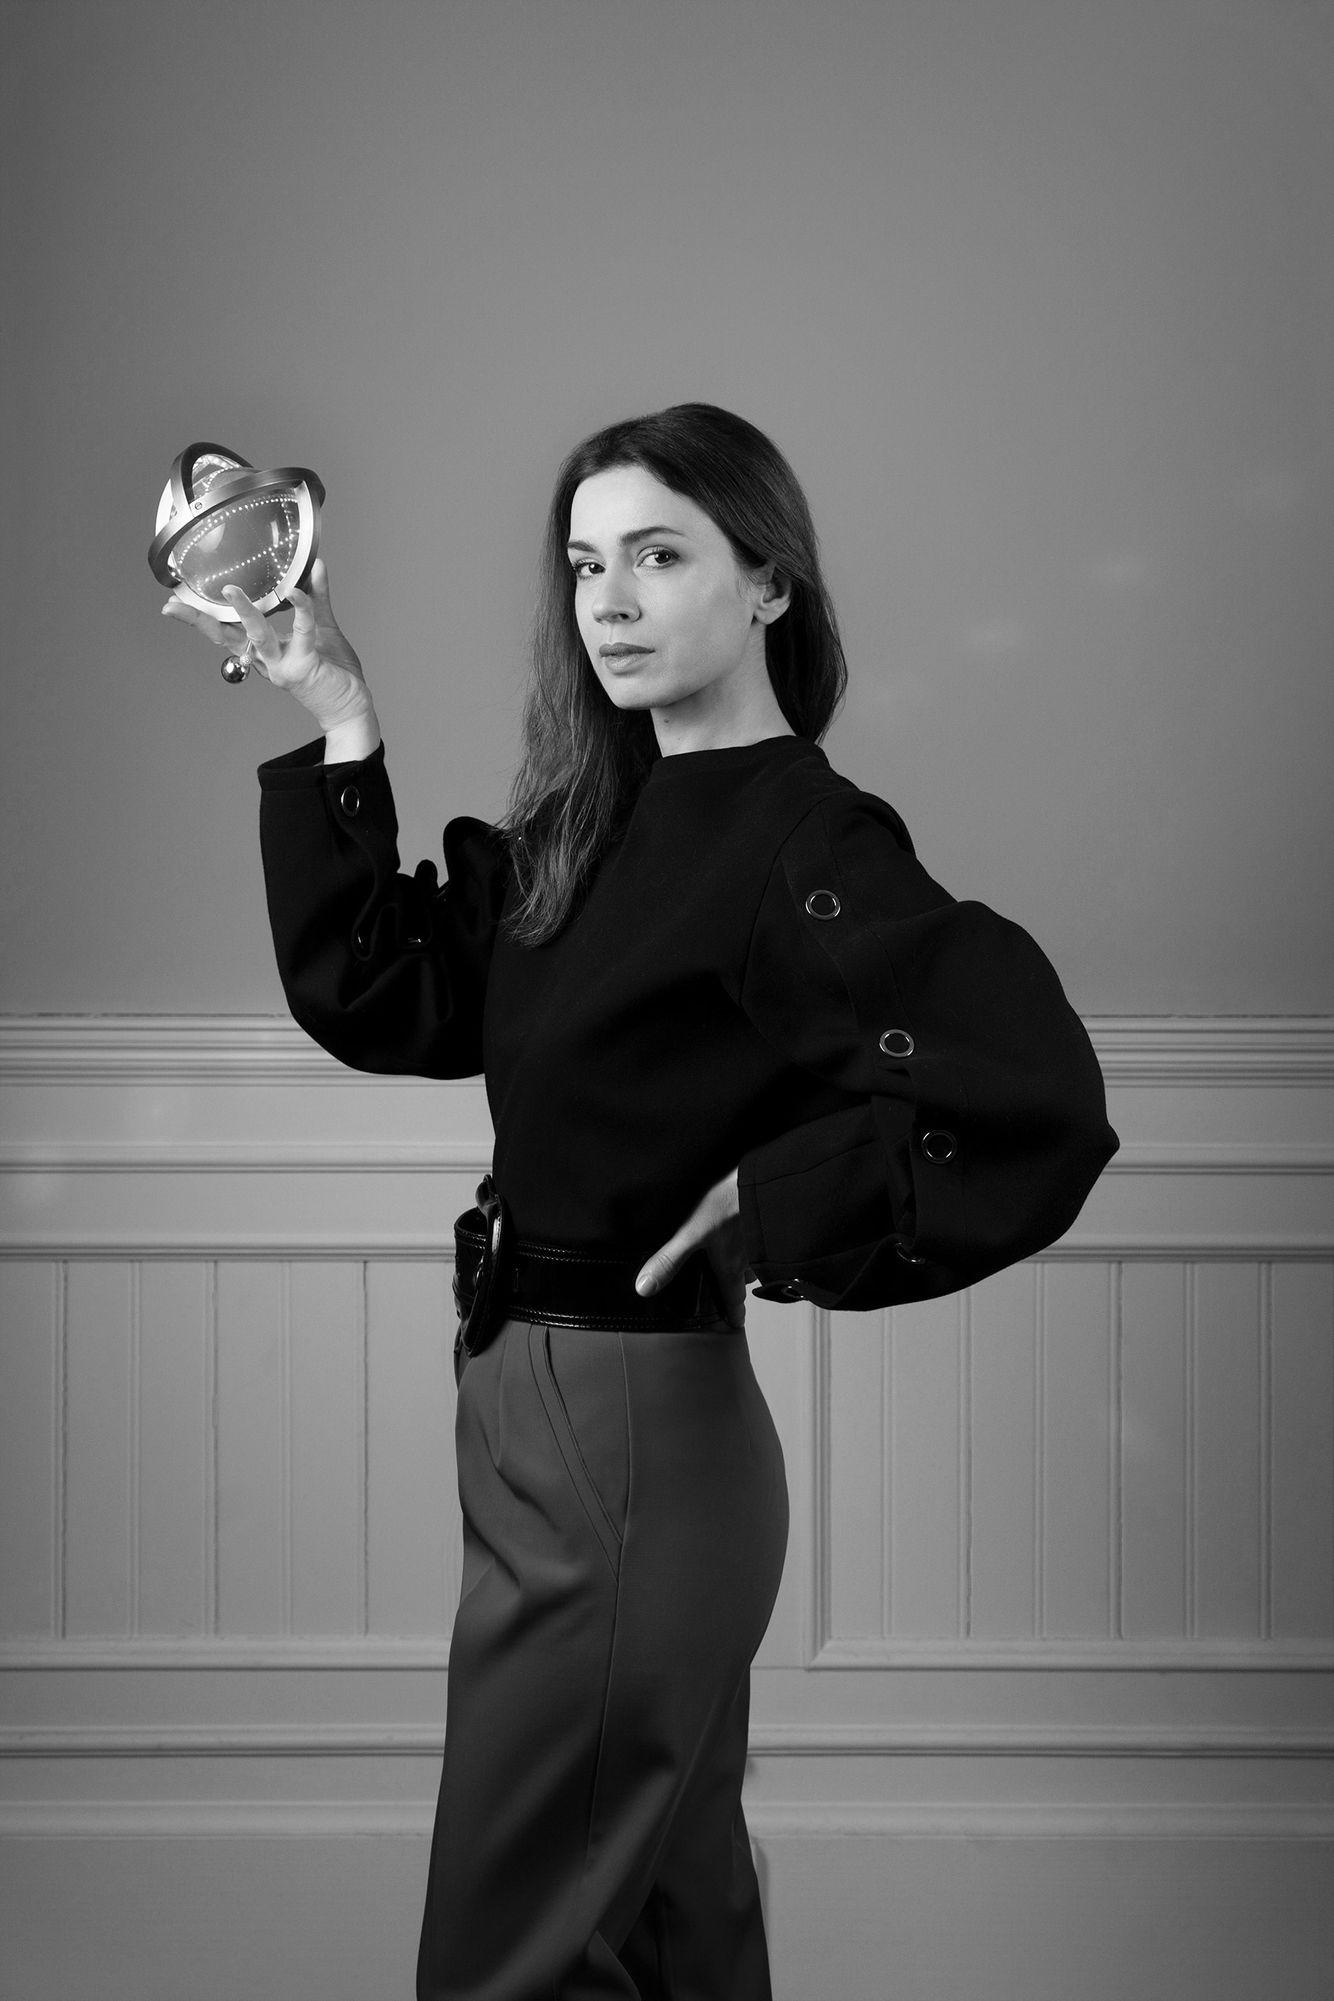 Designer Lara Bohinc